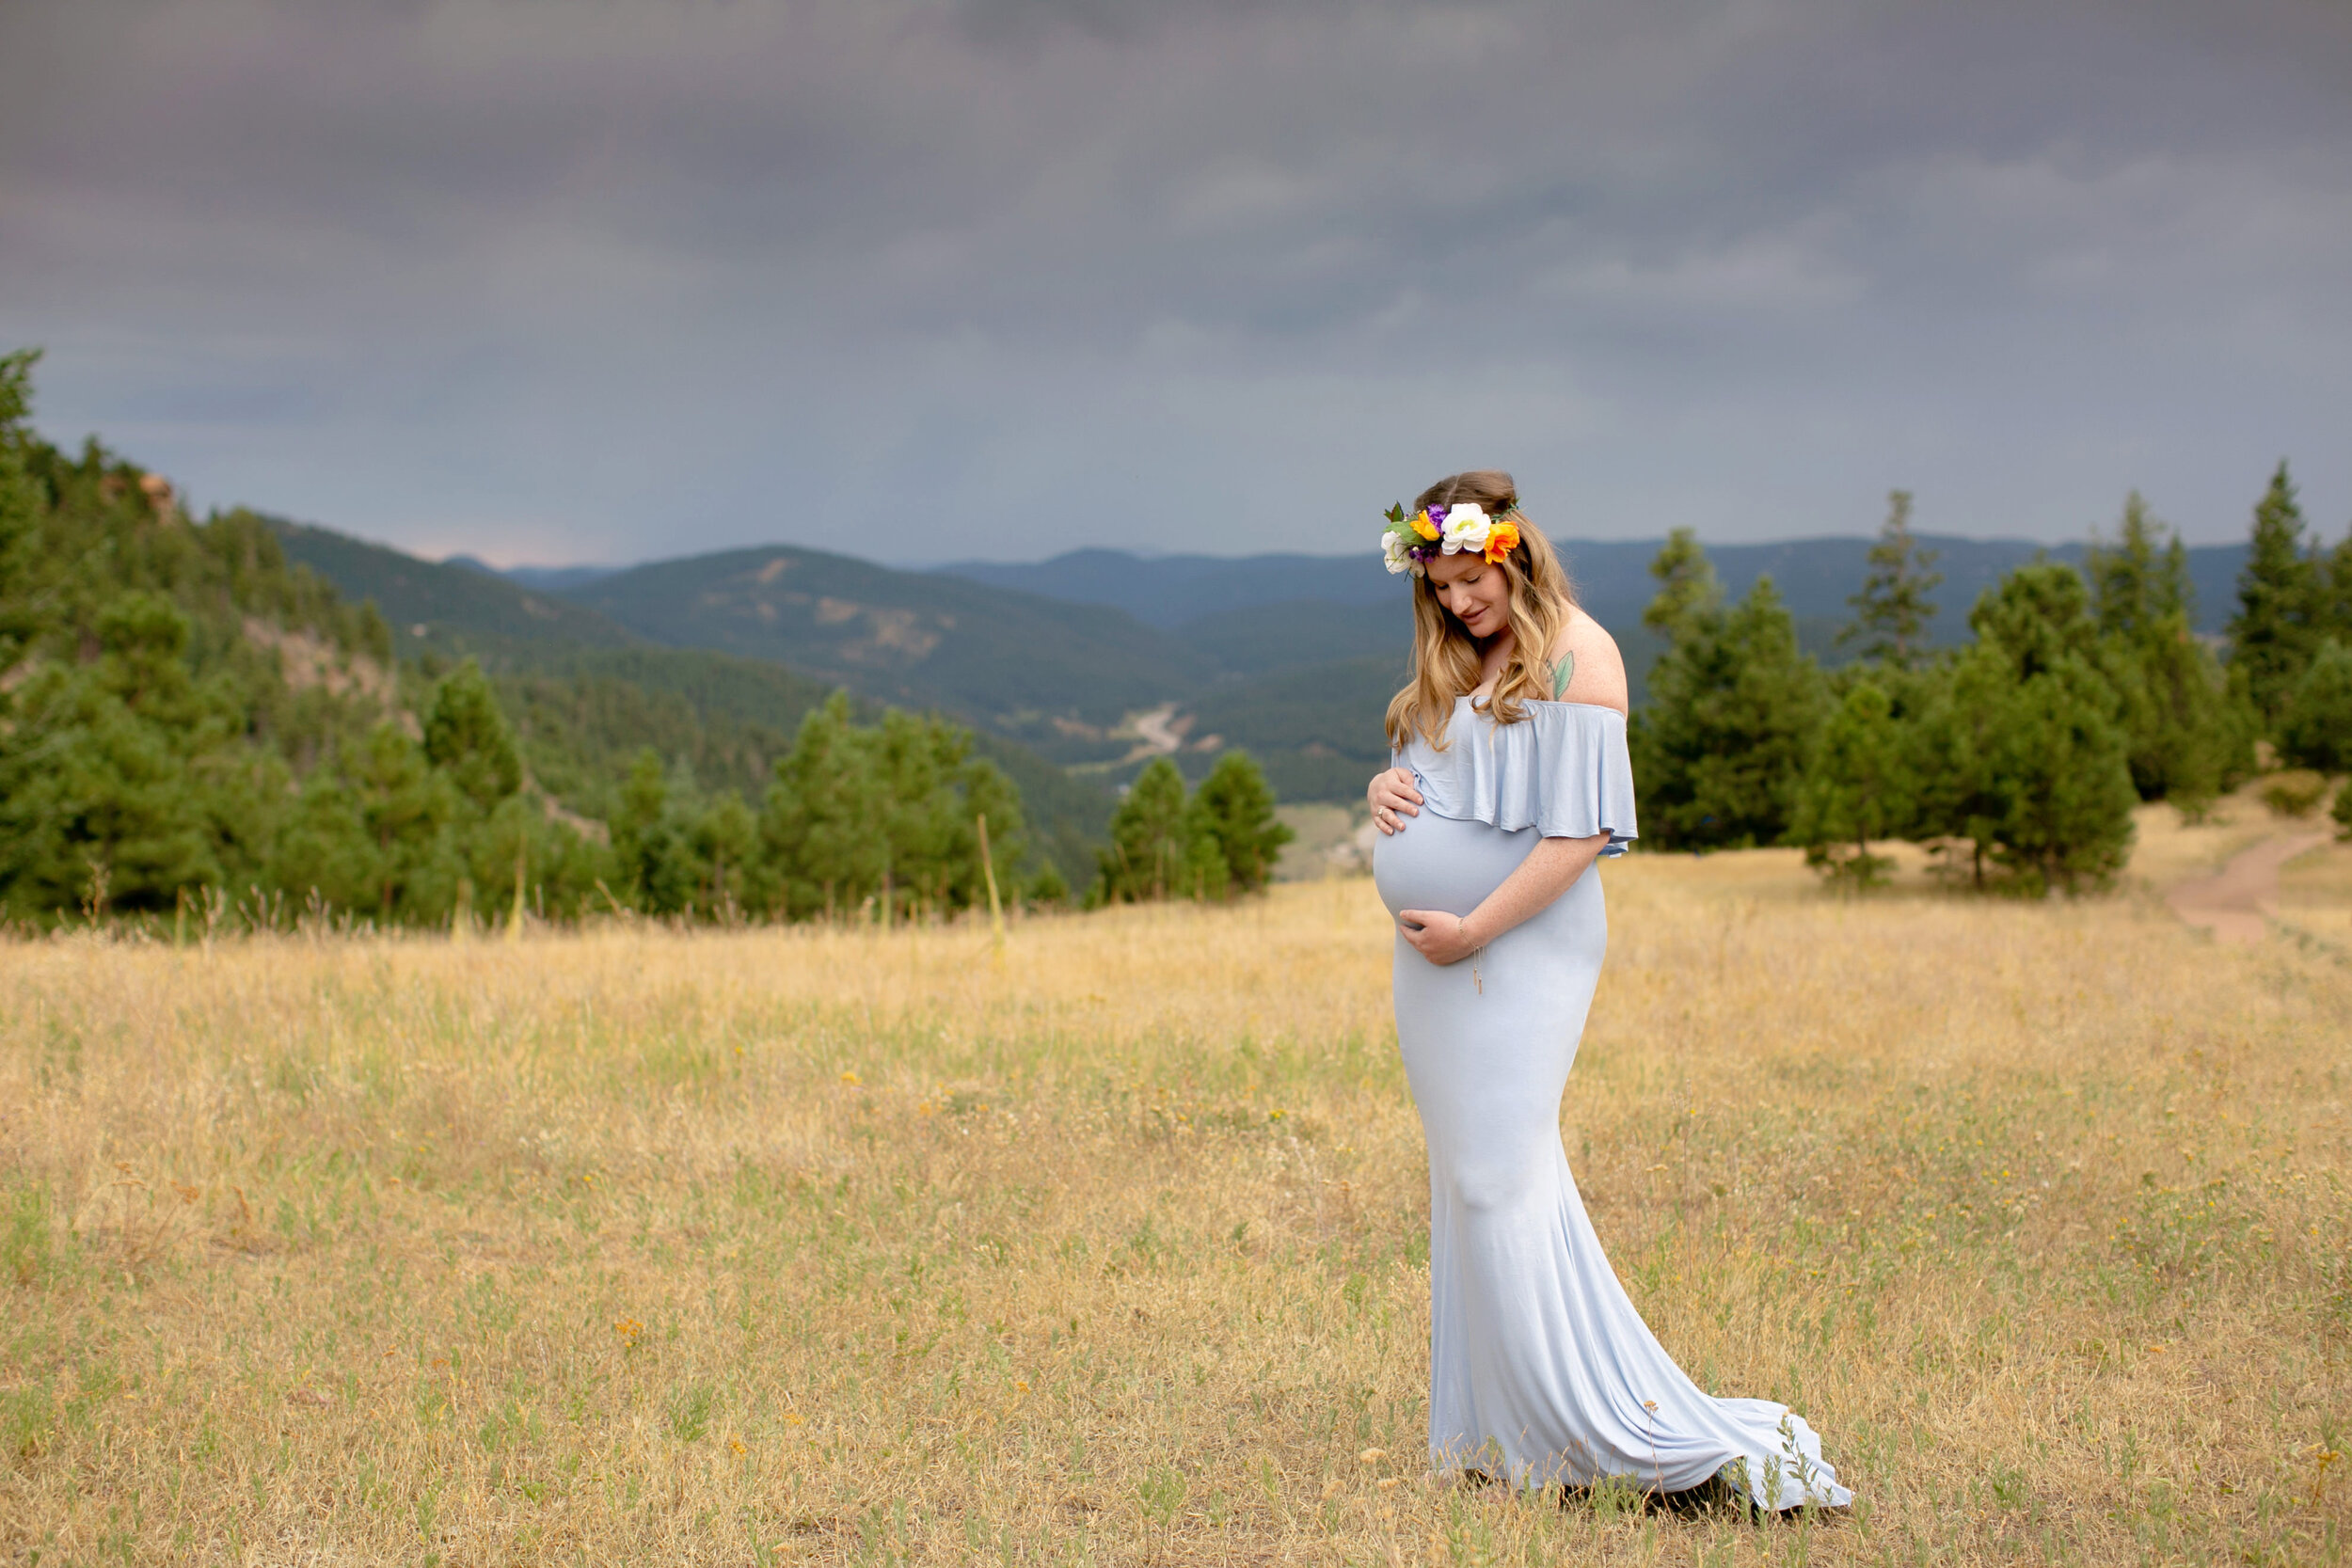 Denver Newborn Photographer, Boulder Newborn Photographer, Boulder Maternity Photographer, Denver Newborn Photographer